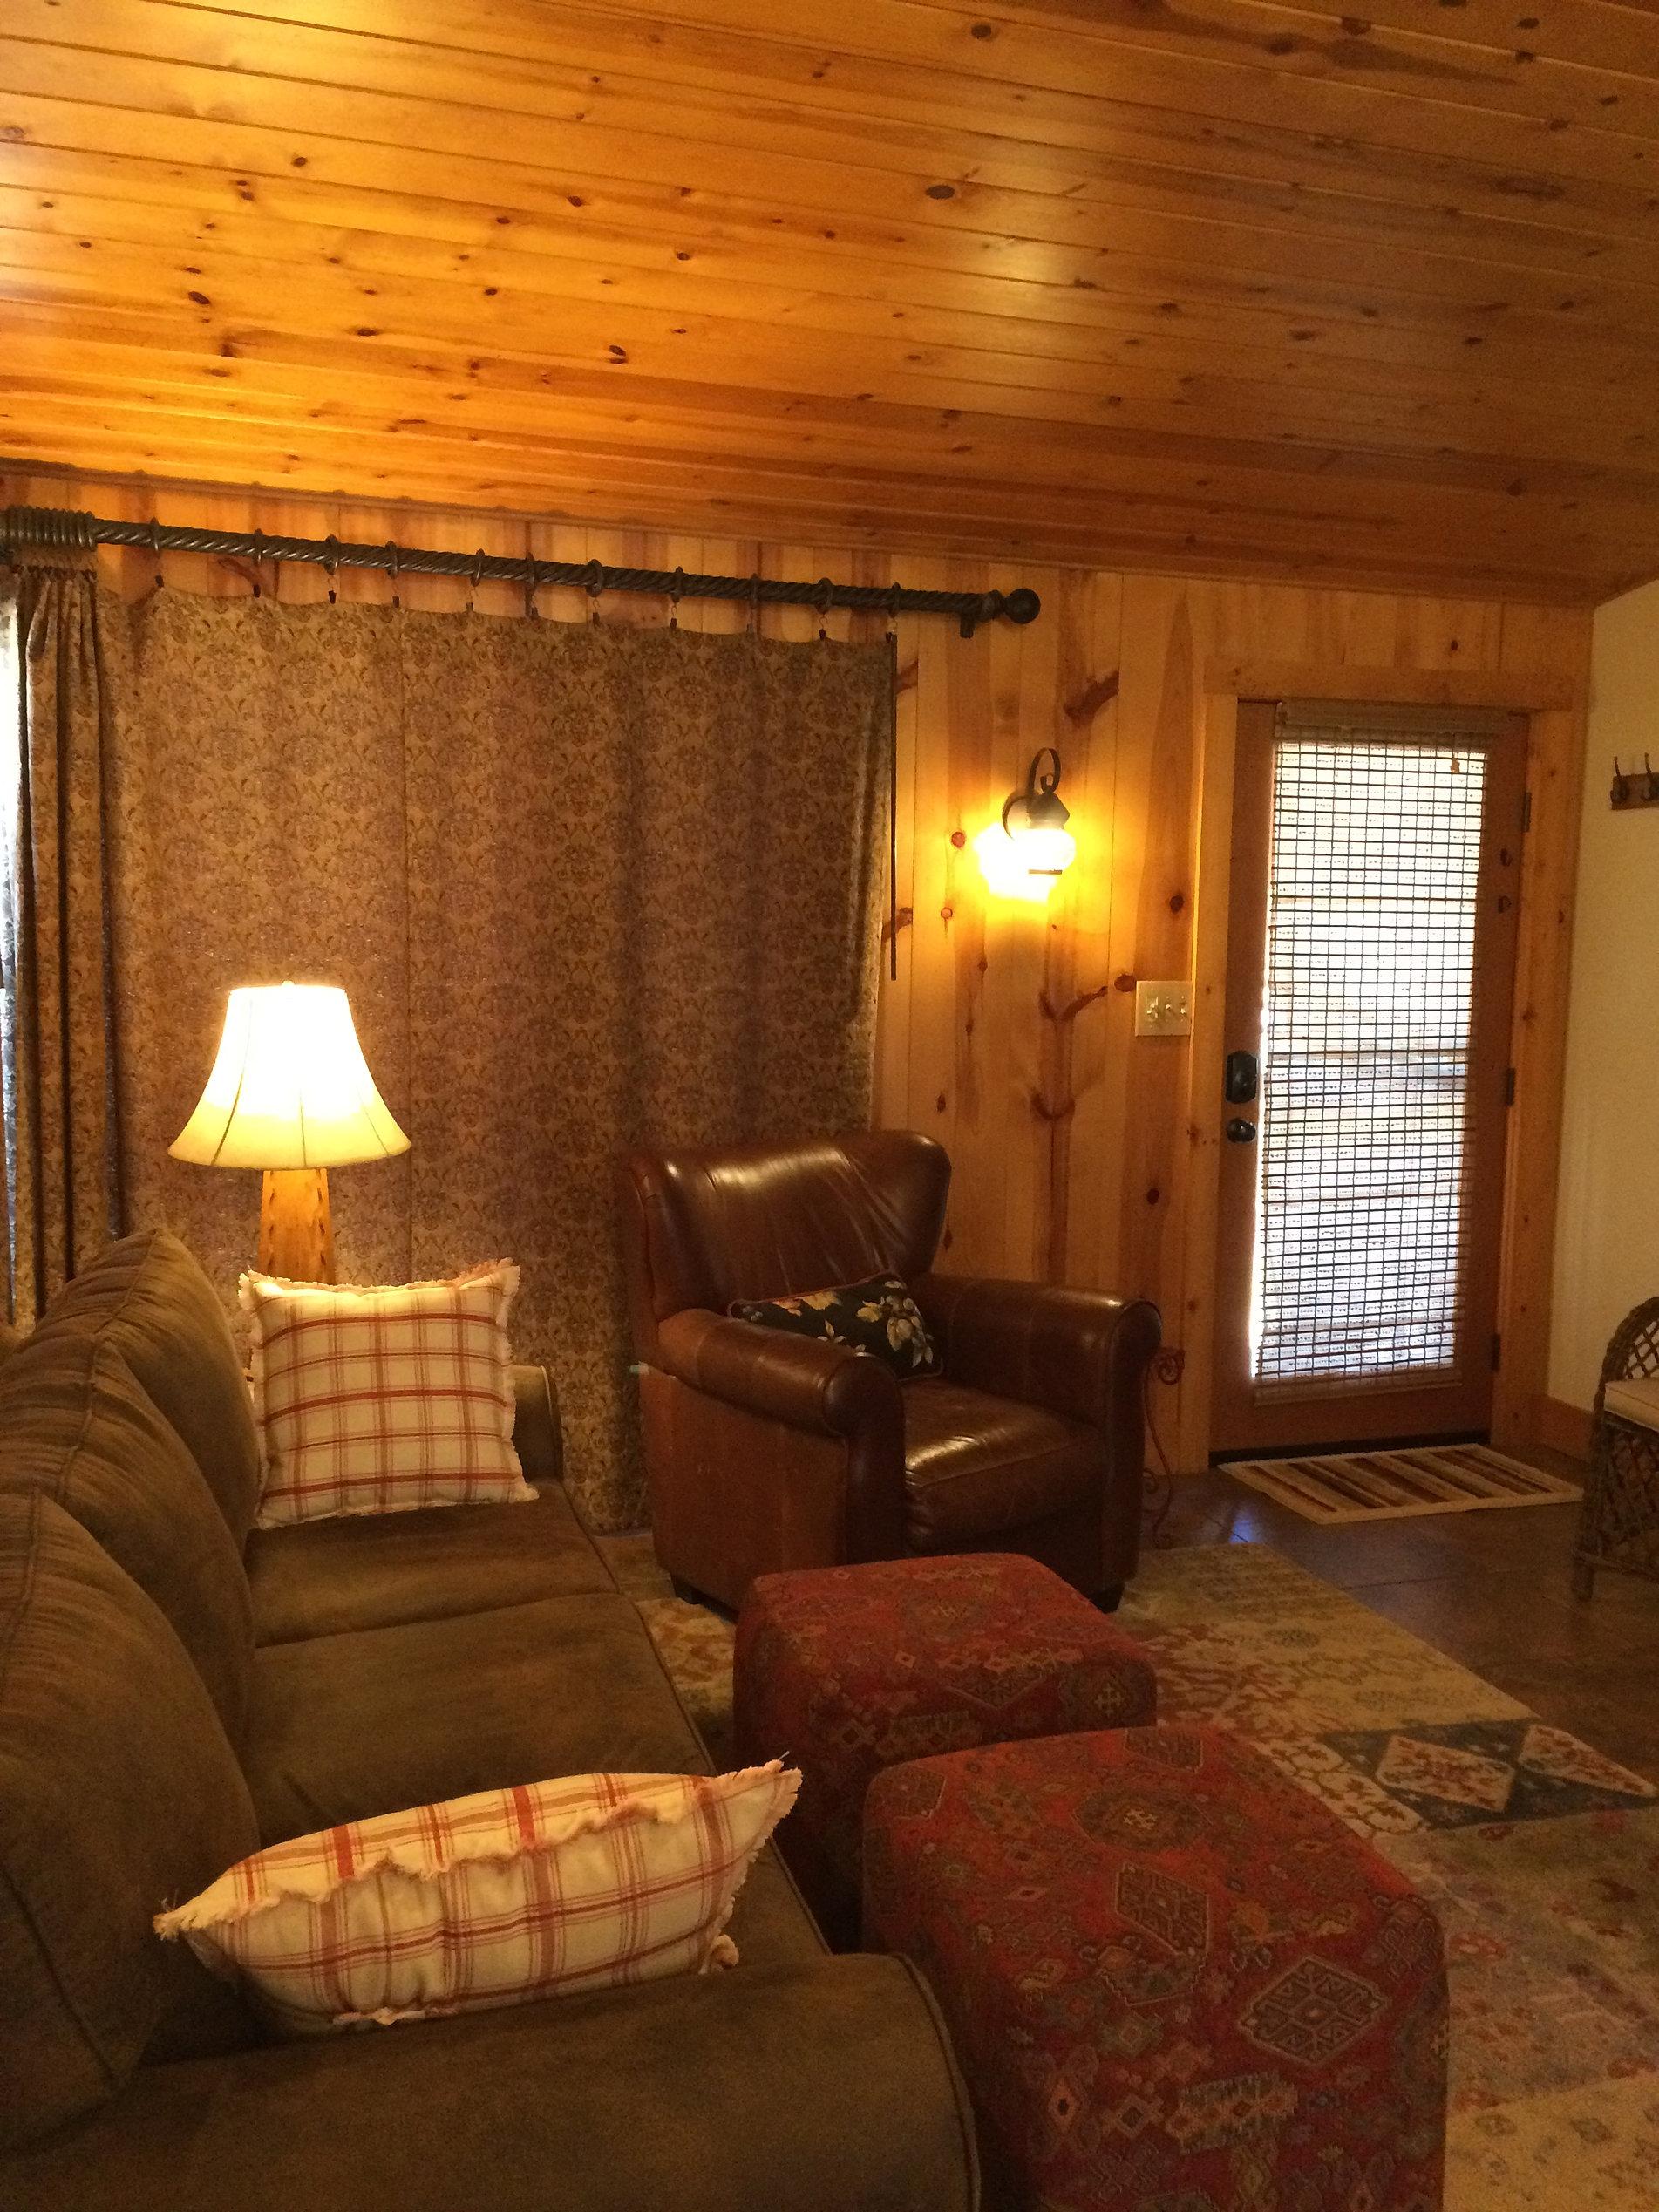 yosemite xxx knob hidden national lodges rocky cabins five gems travel story destinations park